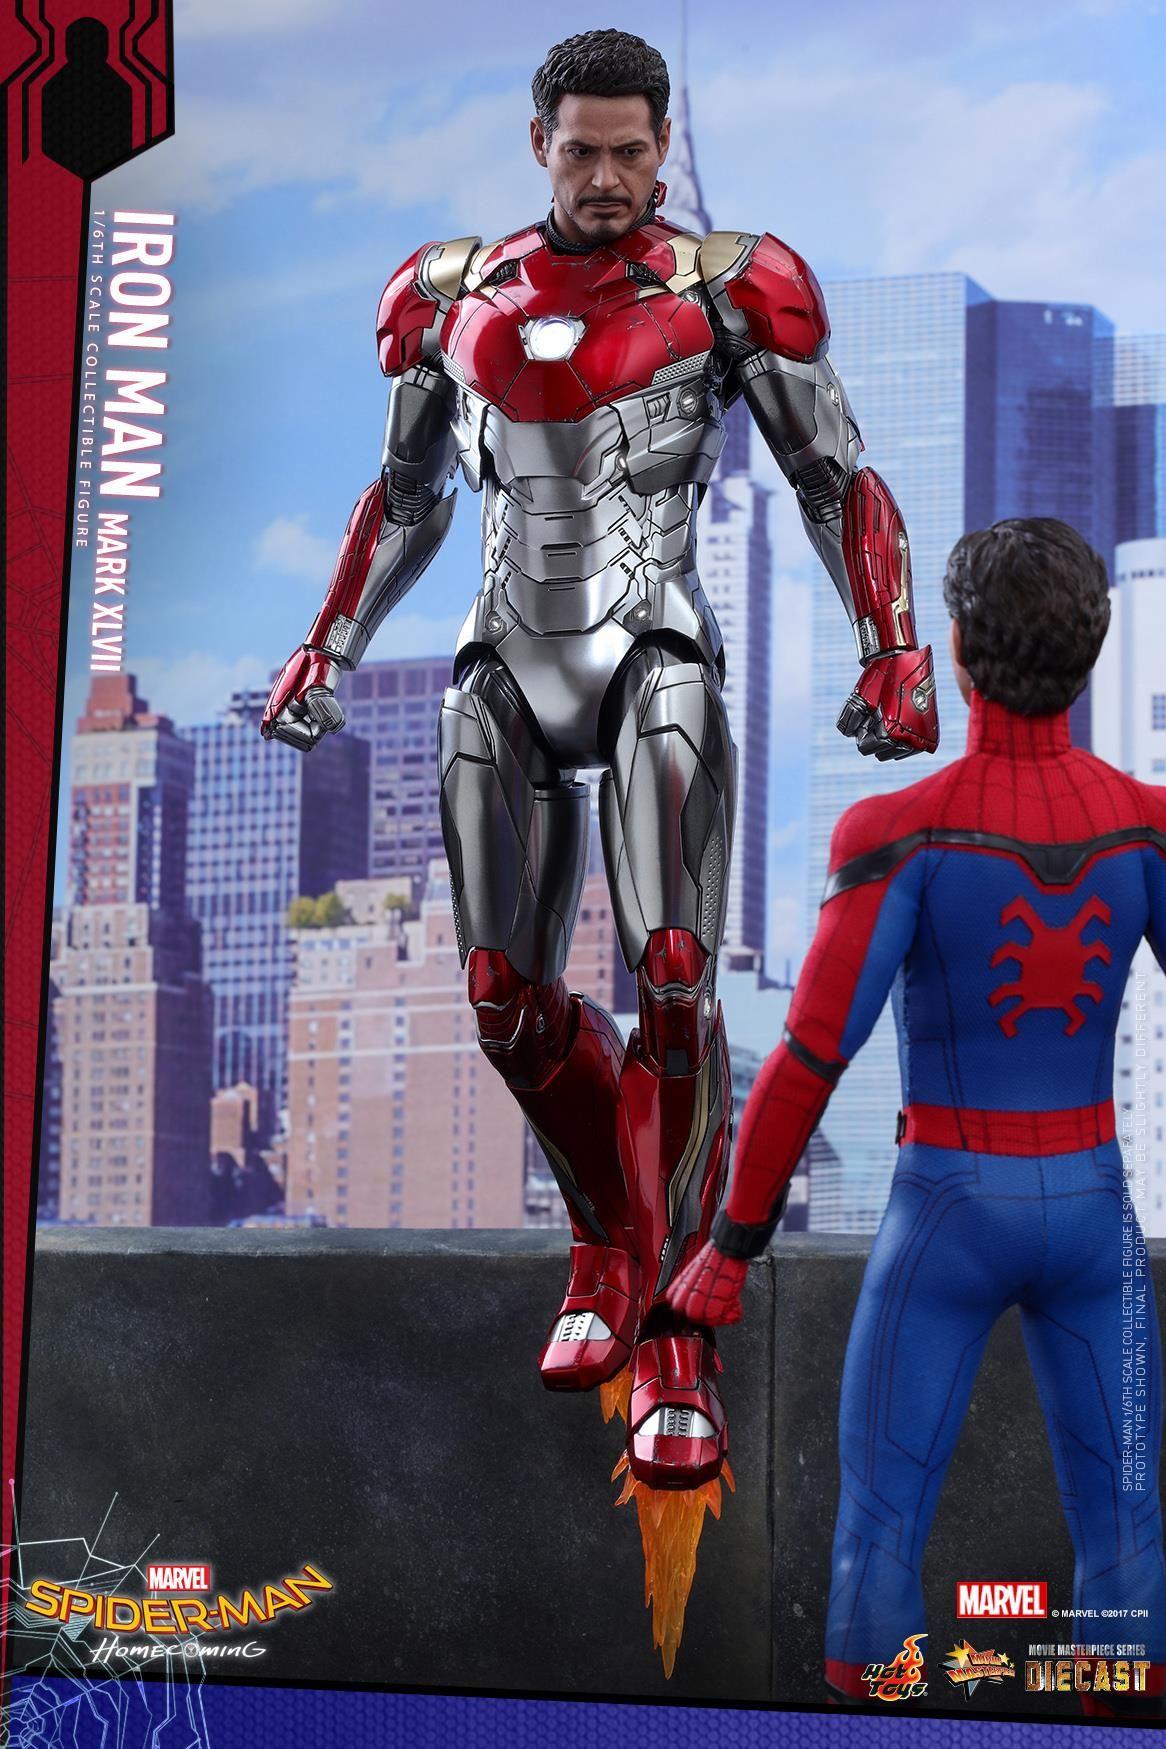 Iron Man Iron Man Mark Spiderman Homecoming